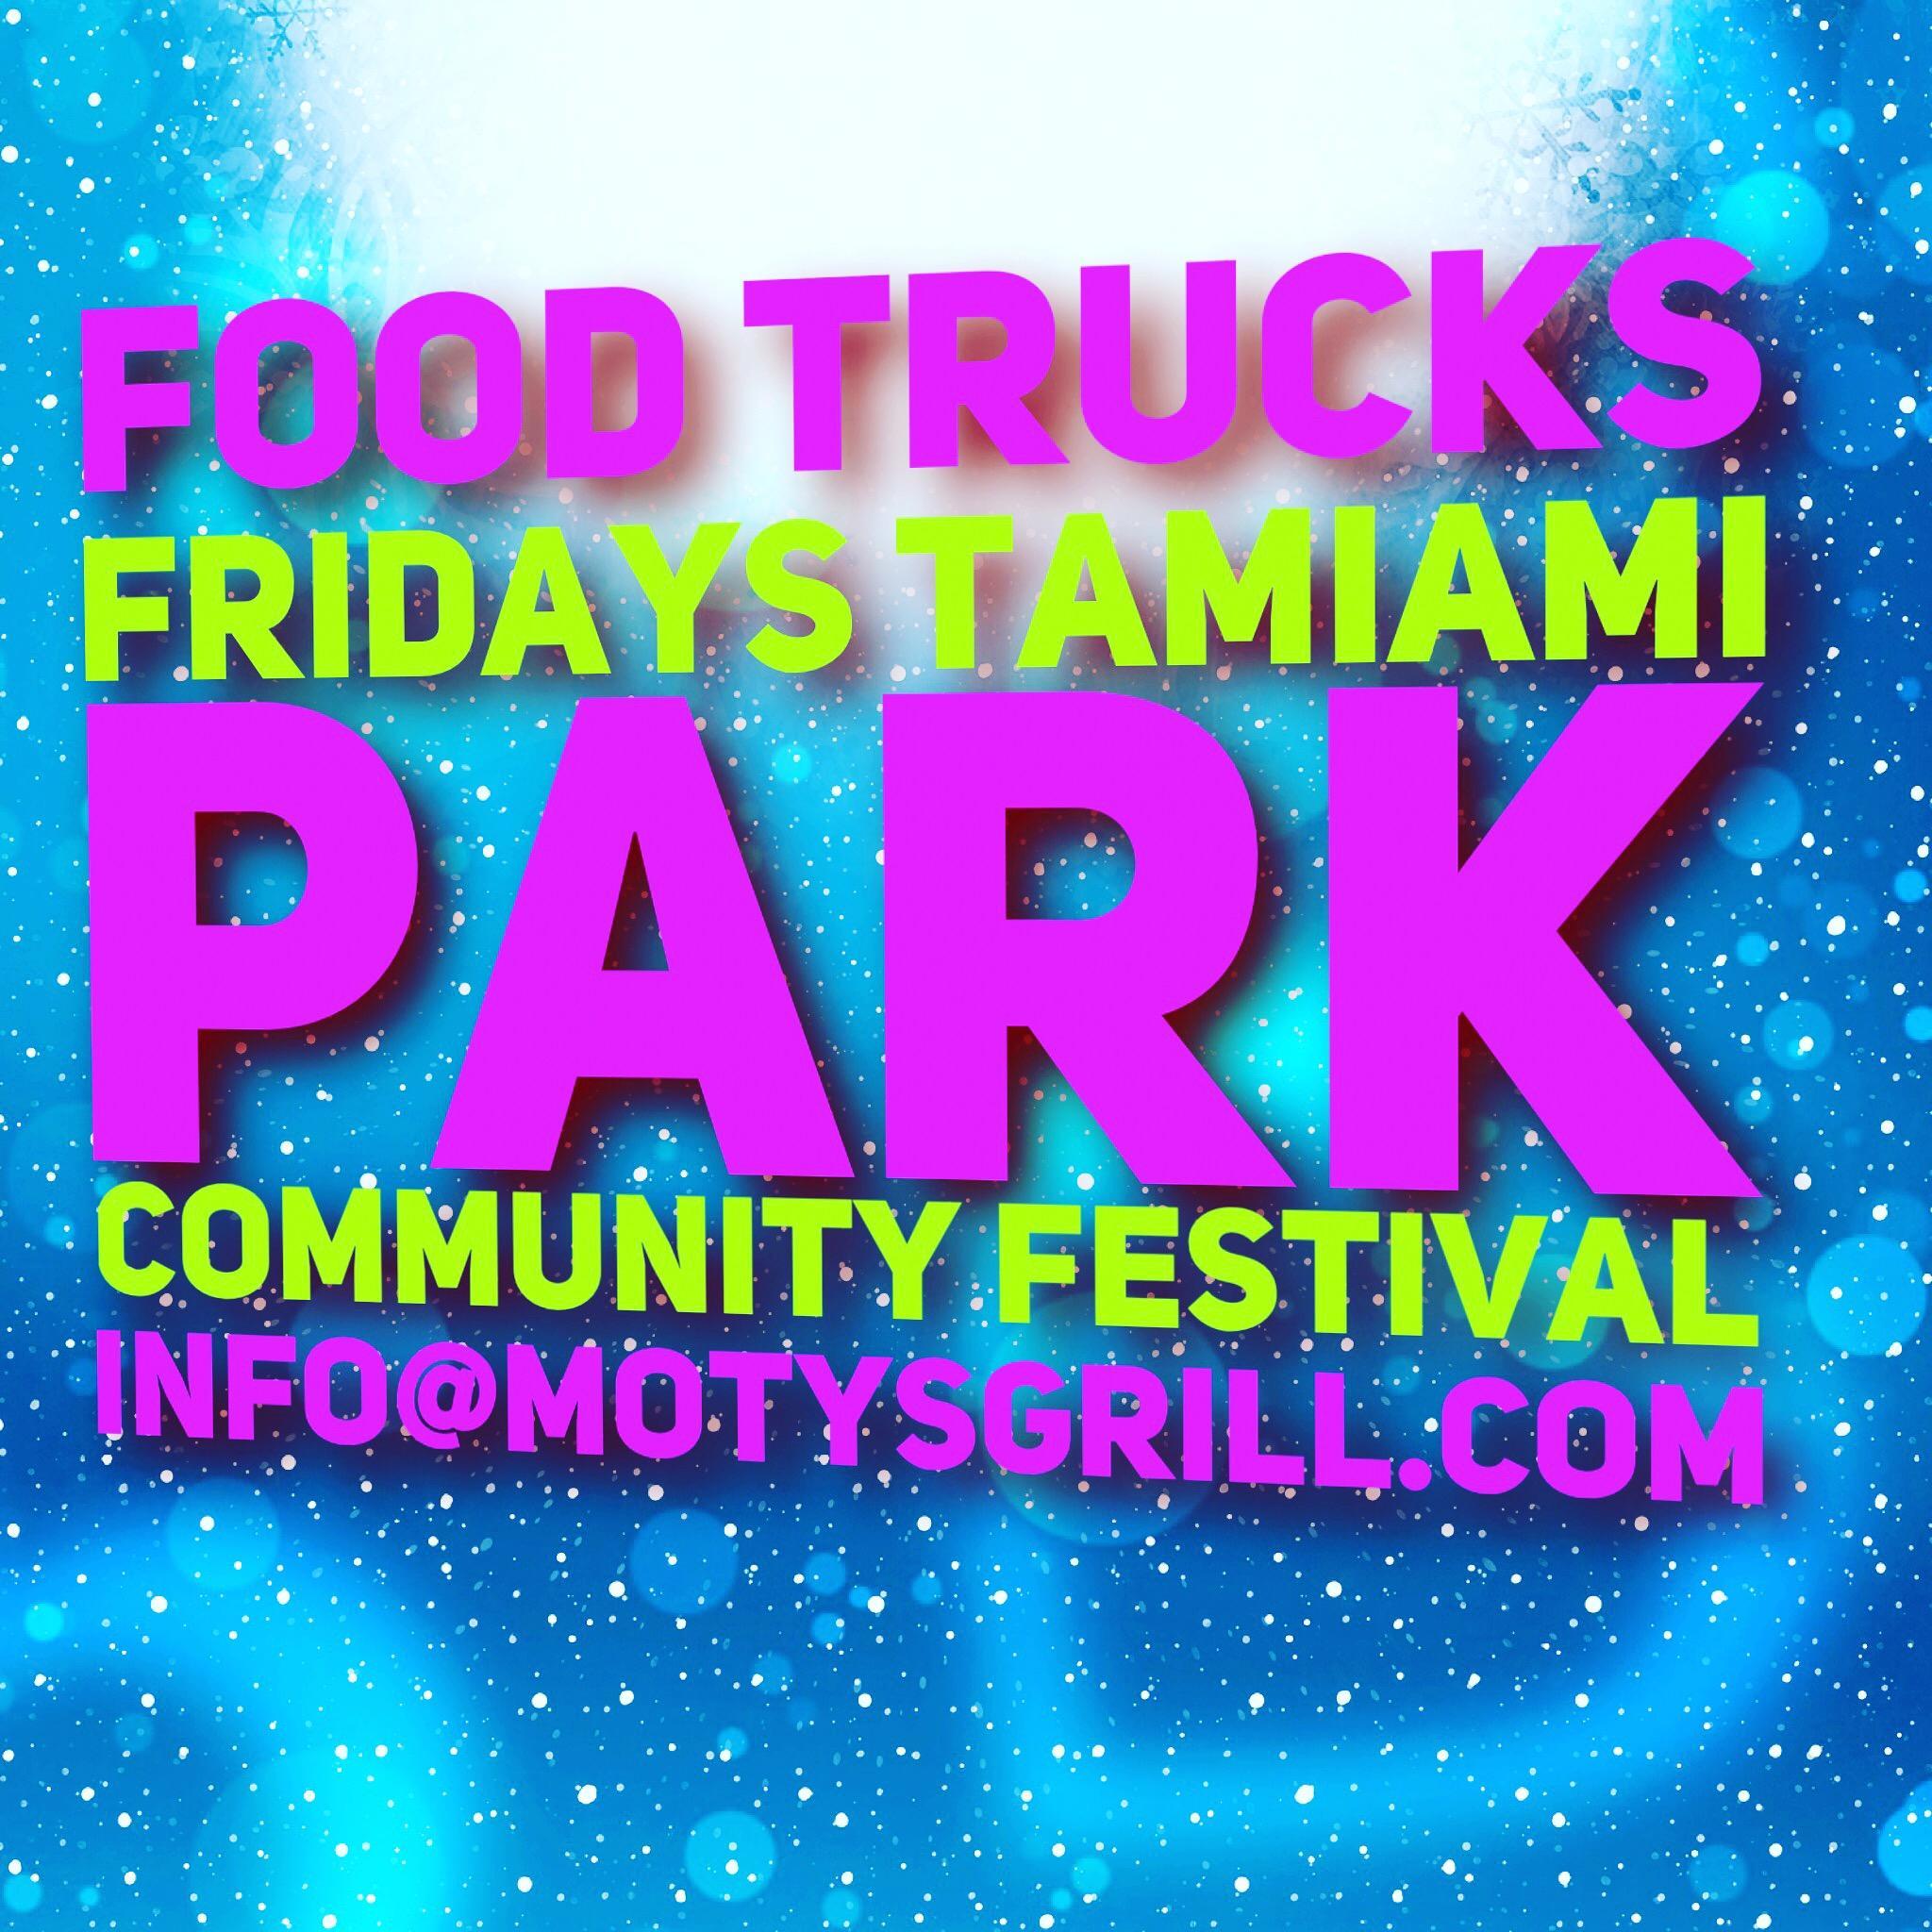 Food trucks Fridays tamiami park. Food trucks Fridays tamiami park